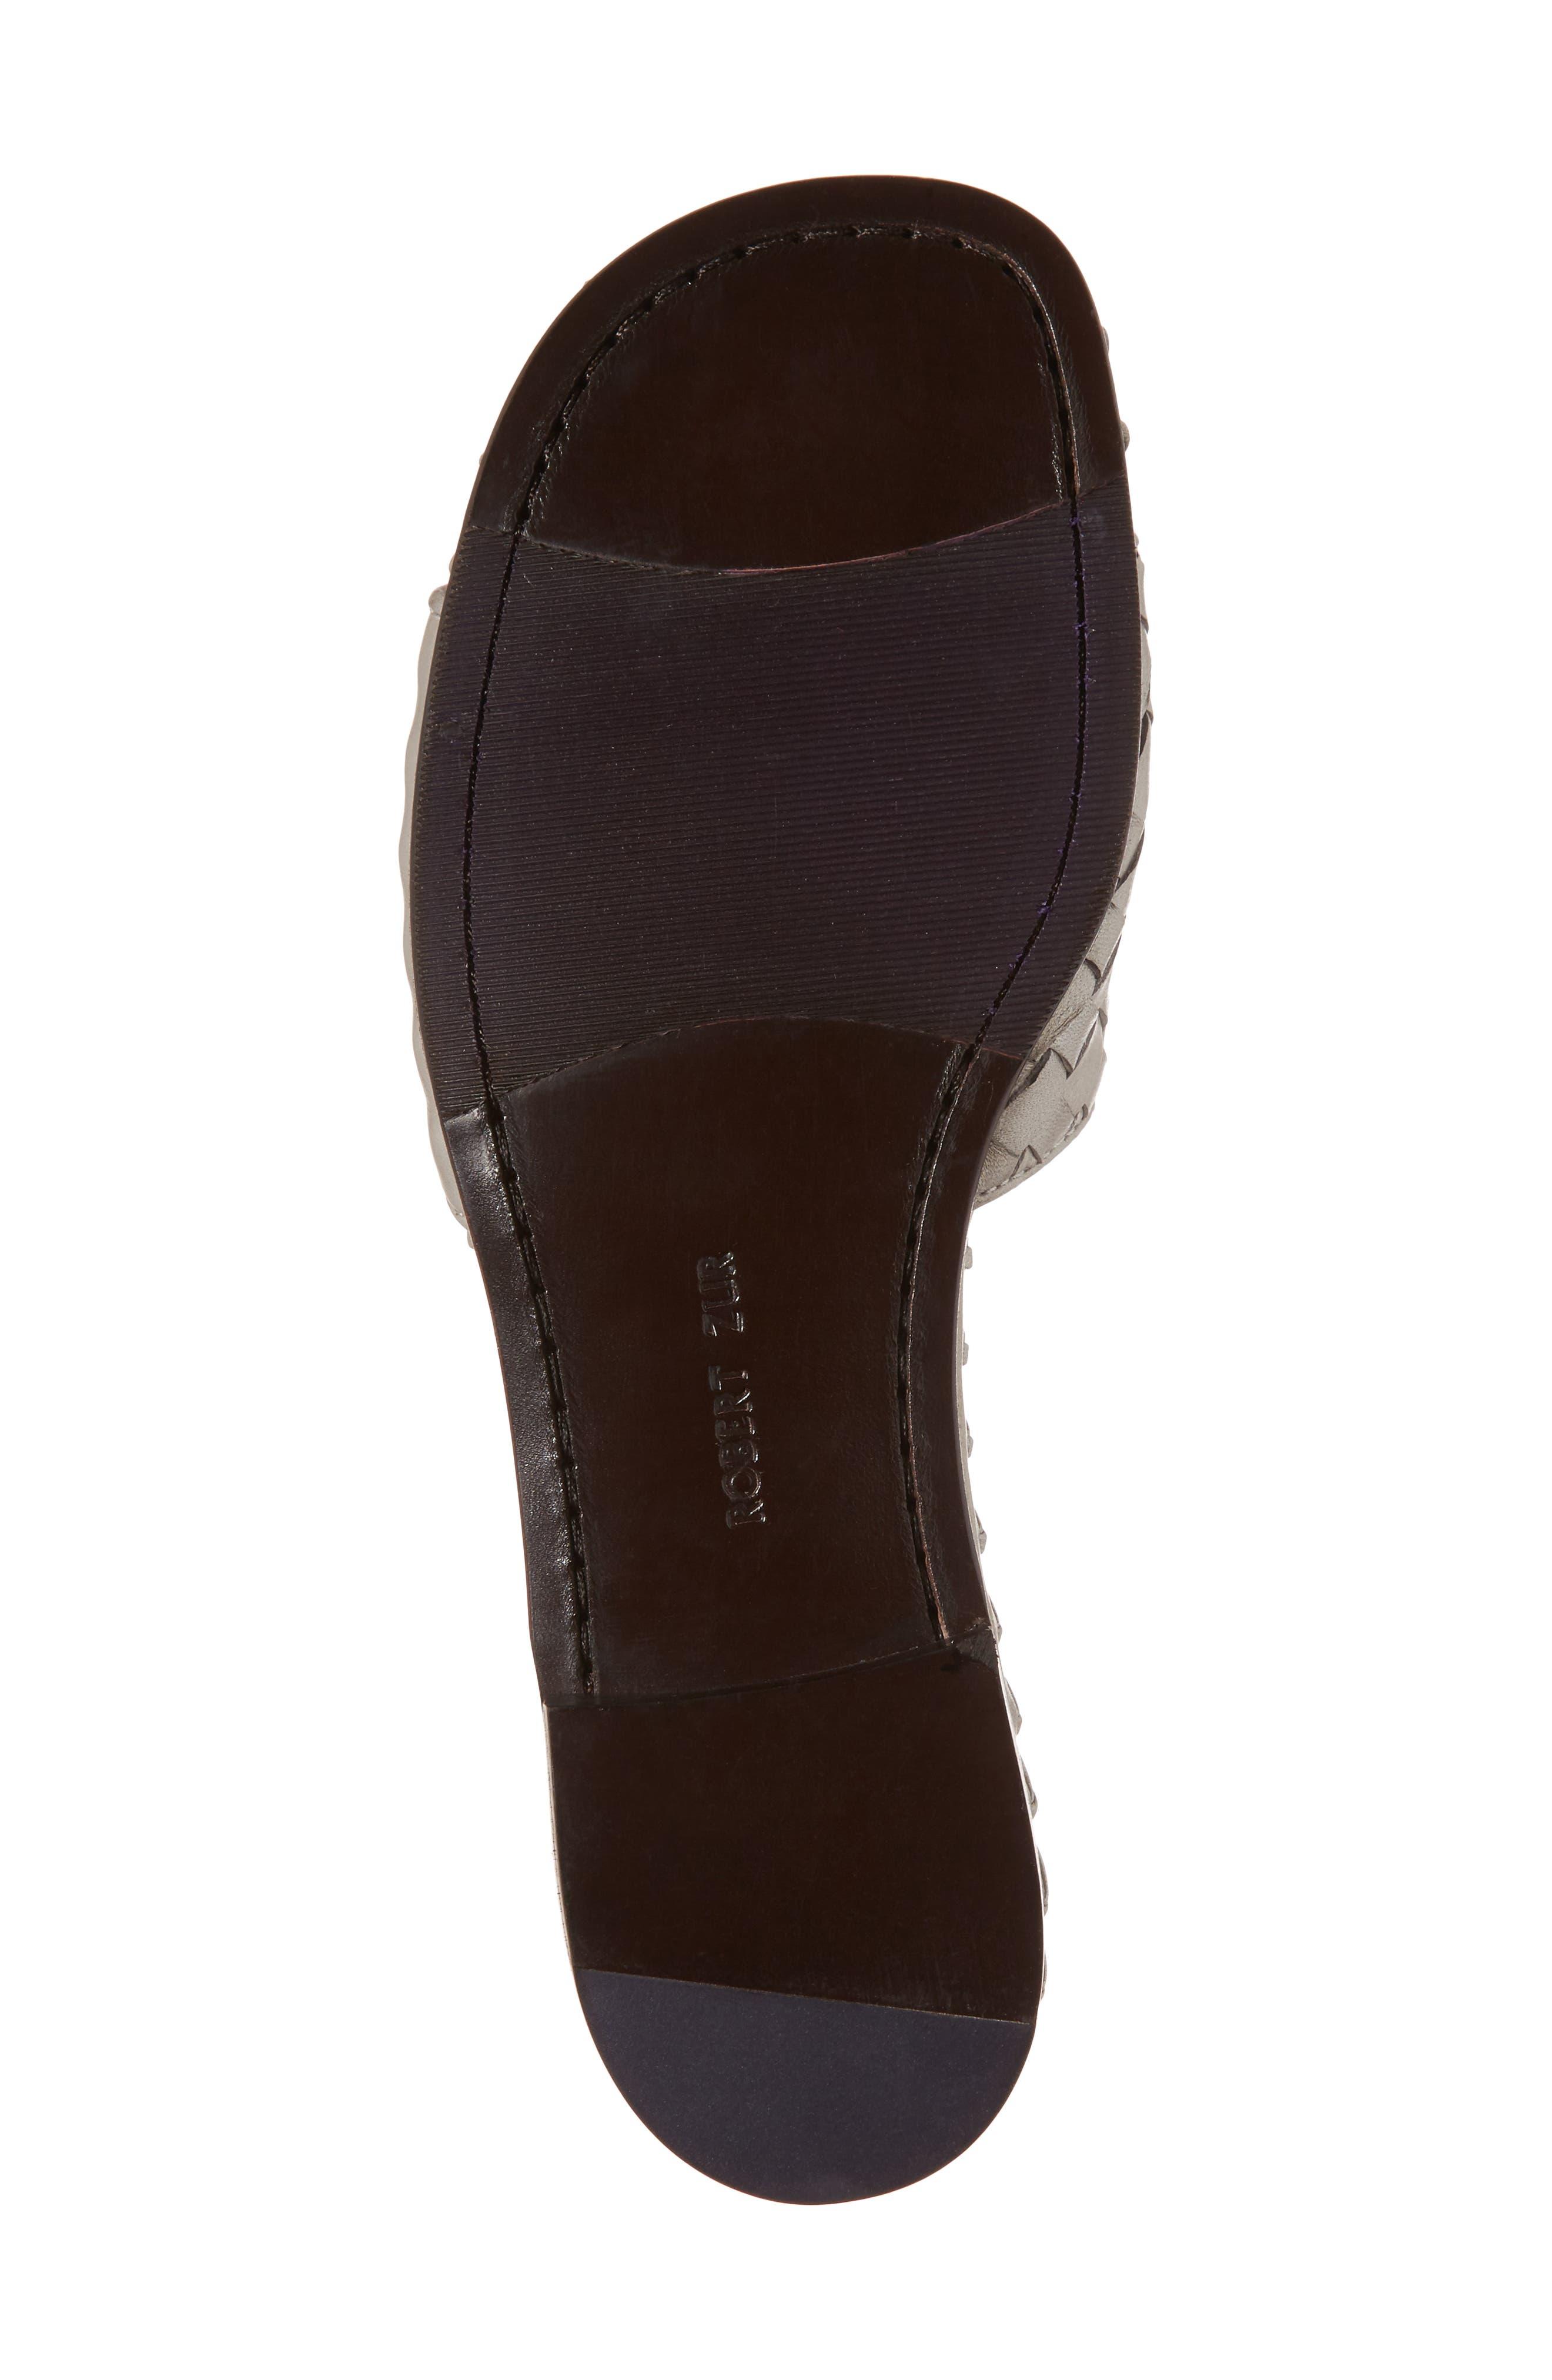 Matilda Woven Slide Sandal,                             Alternate thumbnail 6, color,                             Silver